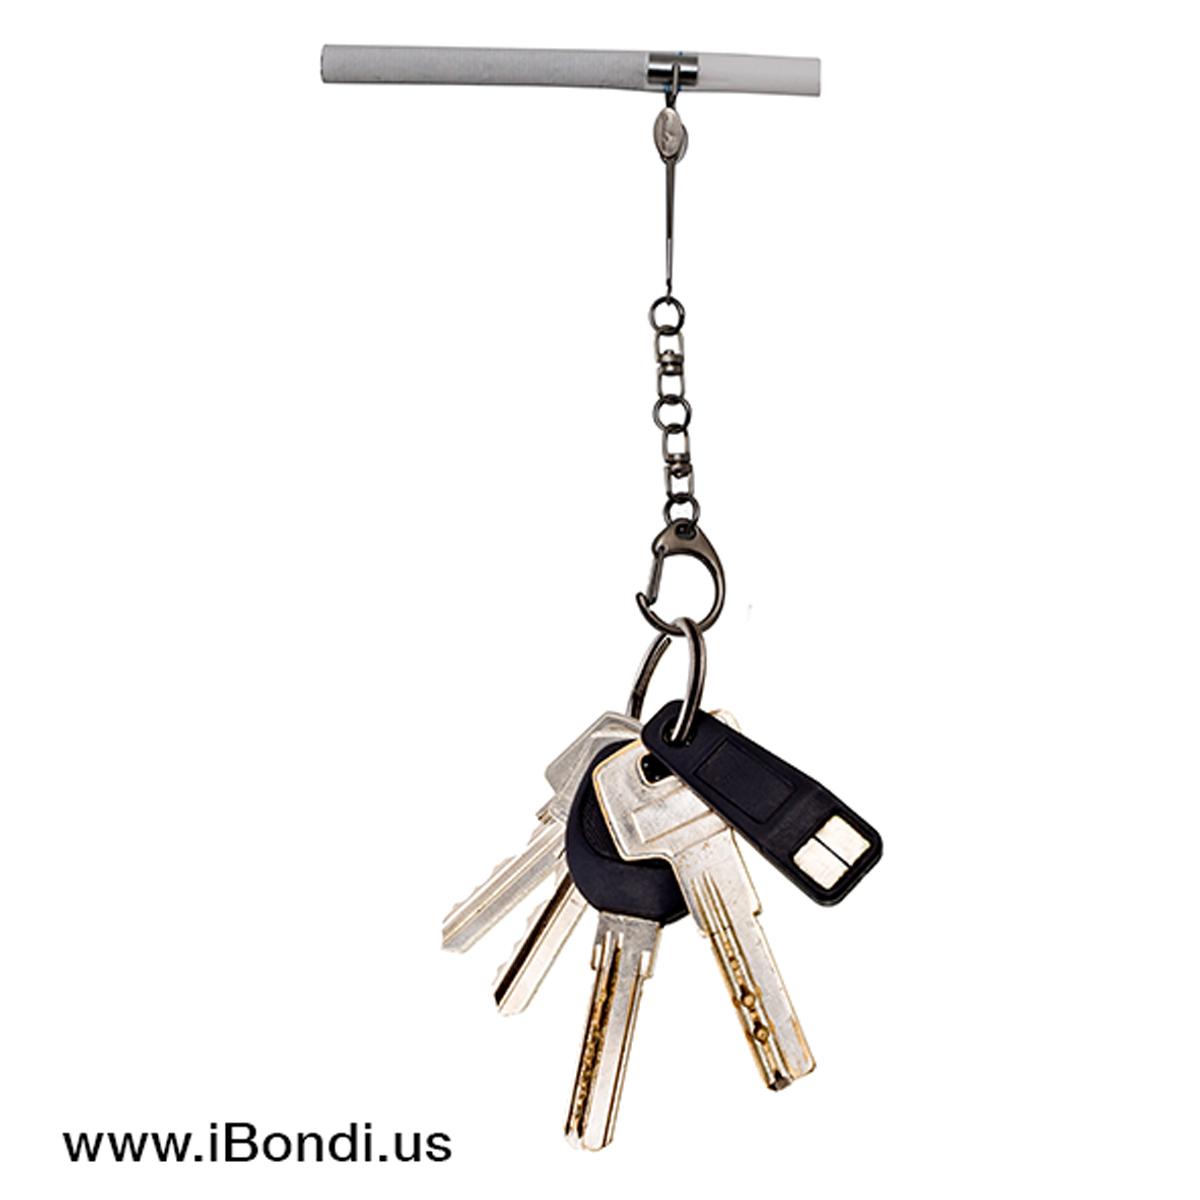 Smokease key holder with keys